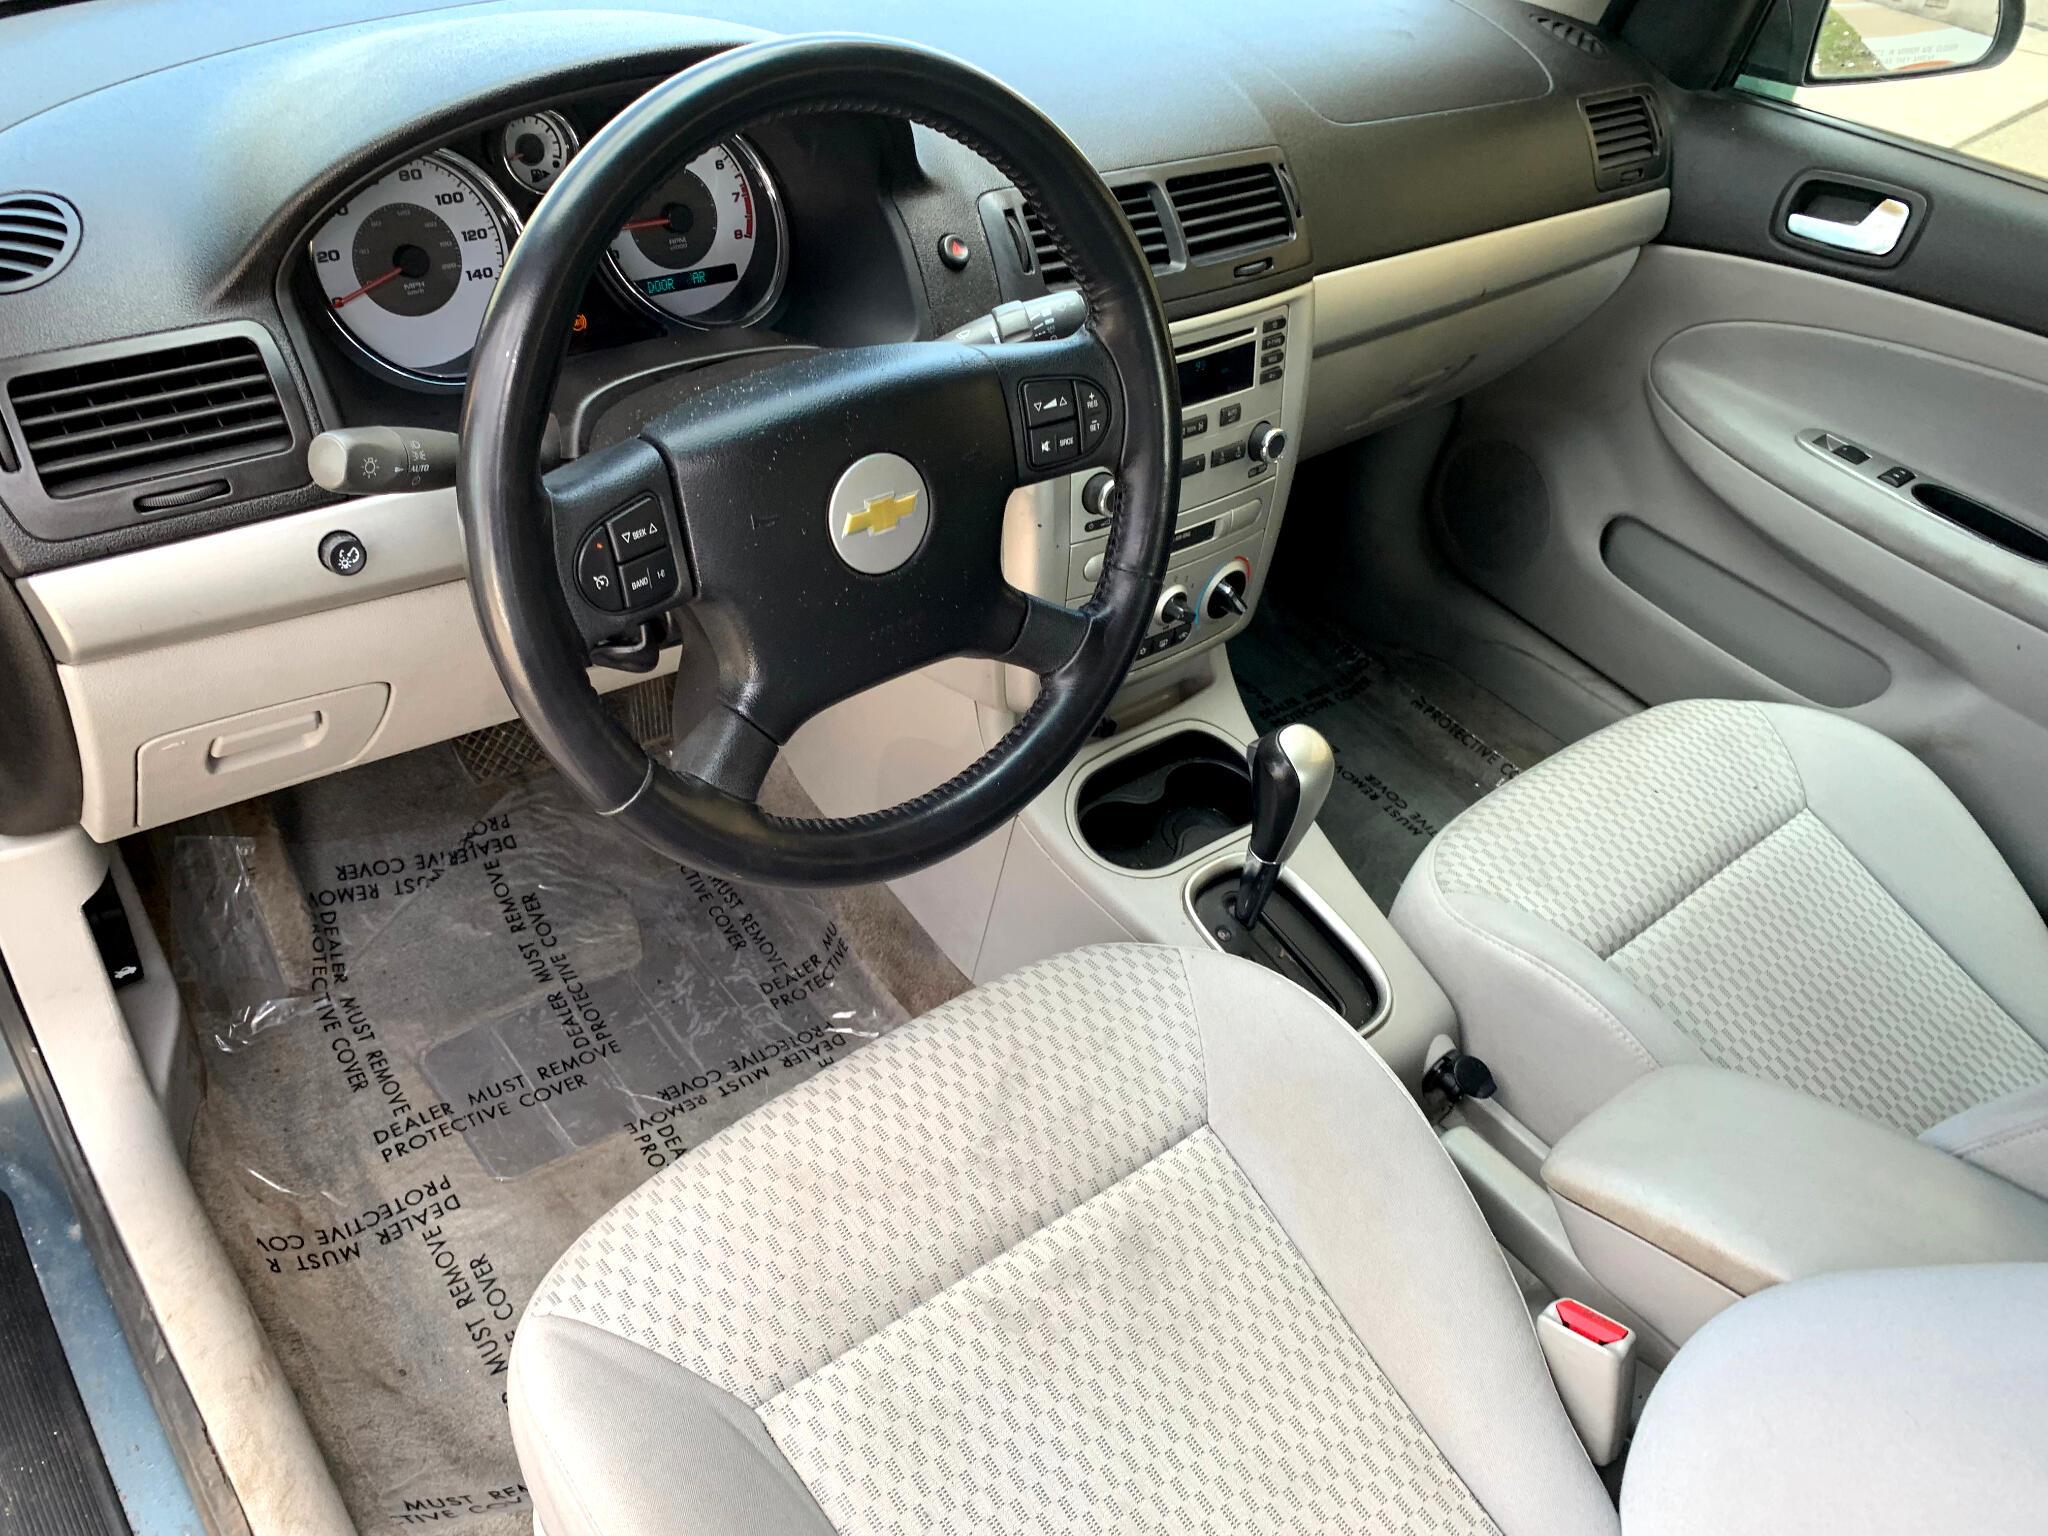 2006 Chevrolet Cobalt 4dr Sdn LT